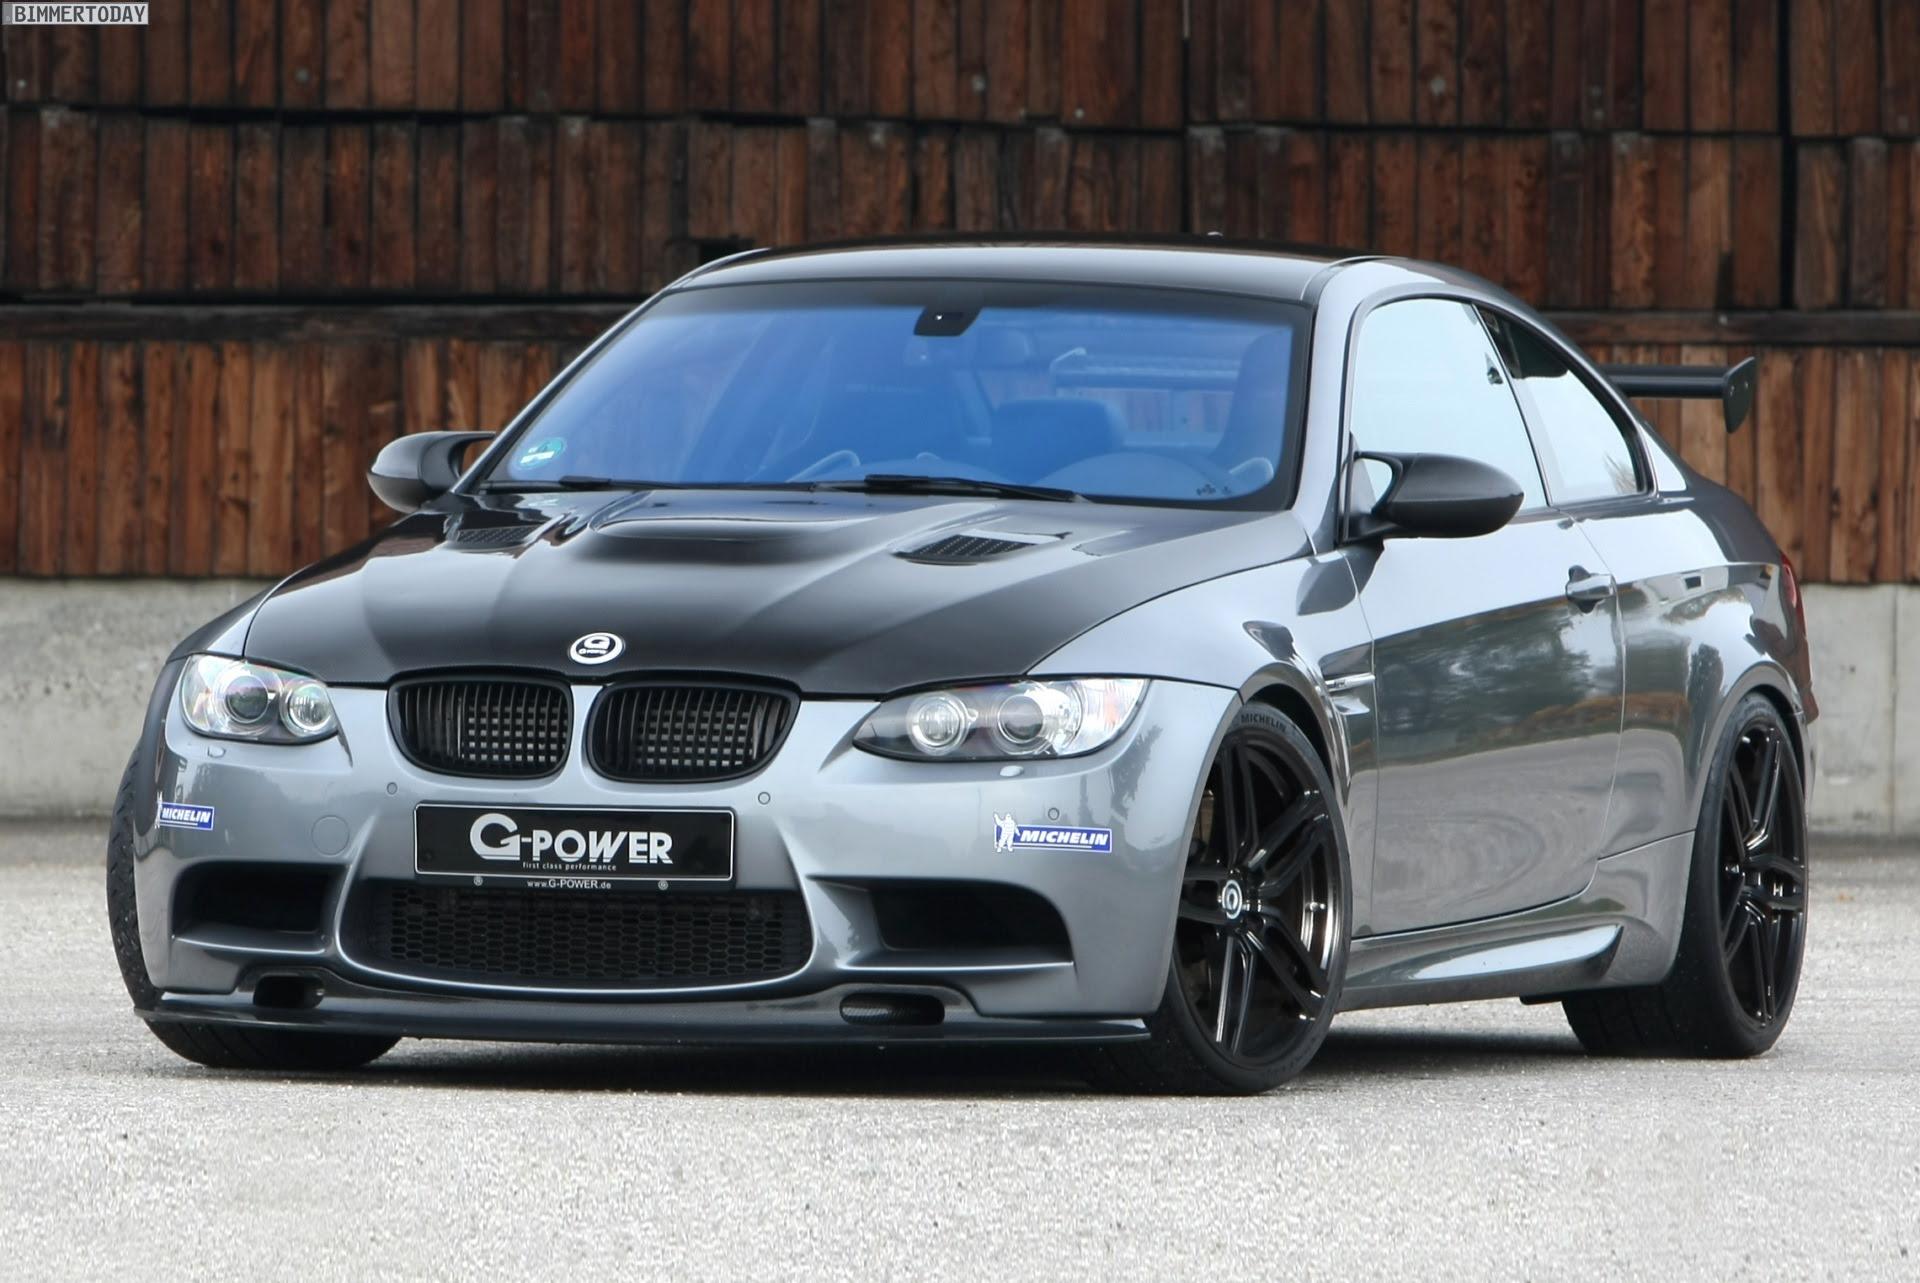 BMW M3 E92 TUNING CARBON  Wroc?awski Informator Internetowy  Wroc?aw, Wroclaw, hotele Wroc?aw